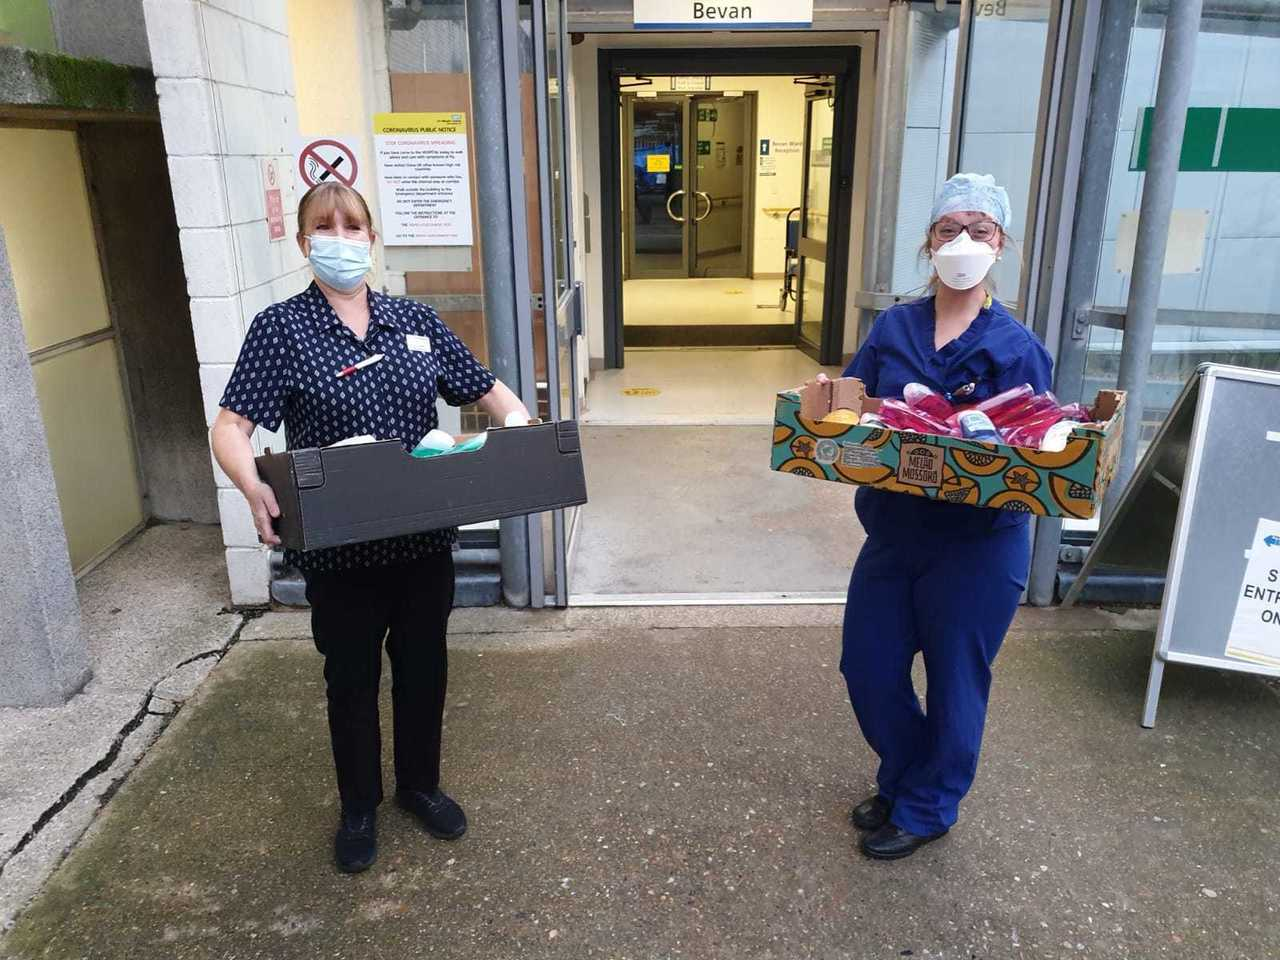 Hillingdon Hospital Charity donation request | Asda Hayes